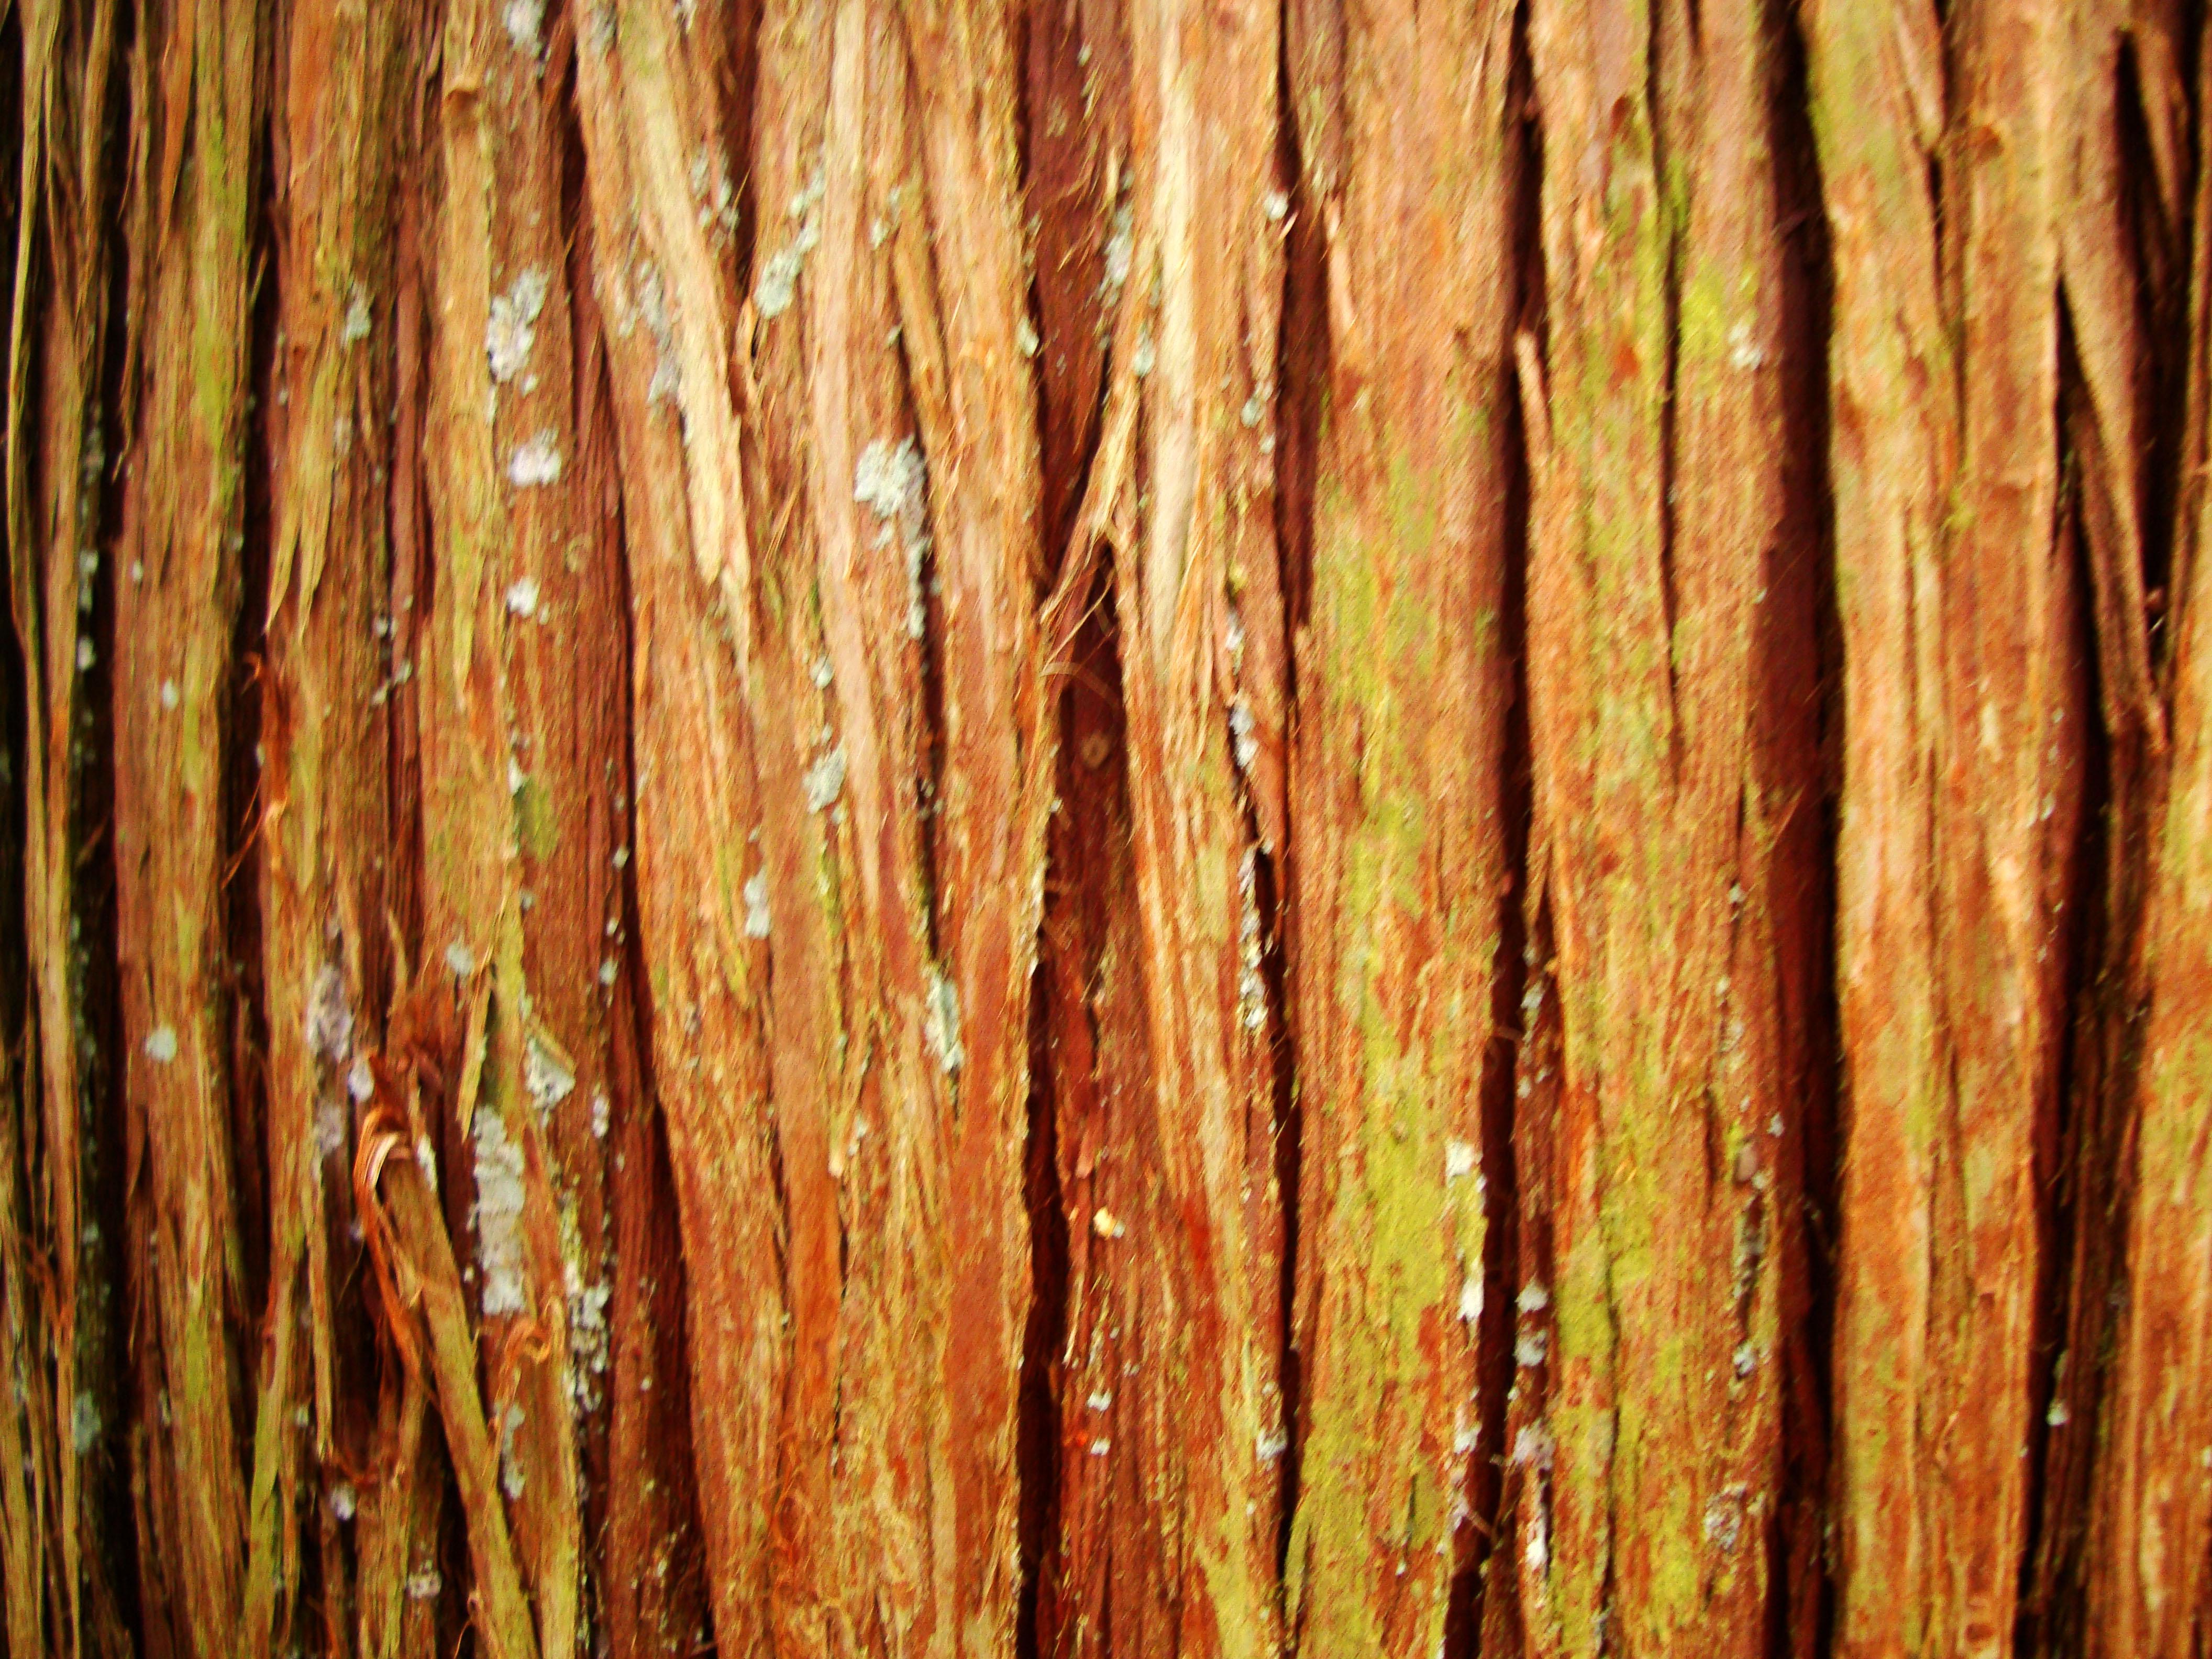 Rokuon ji Temple pine tree textures Kyoto Japan Nov 2009 03